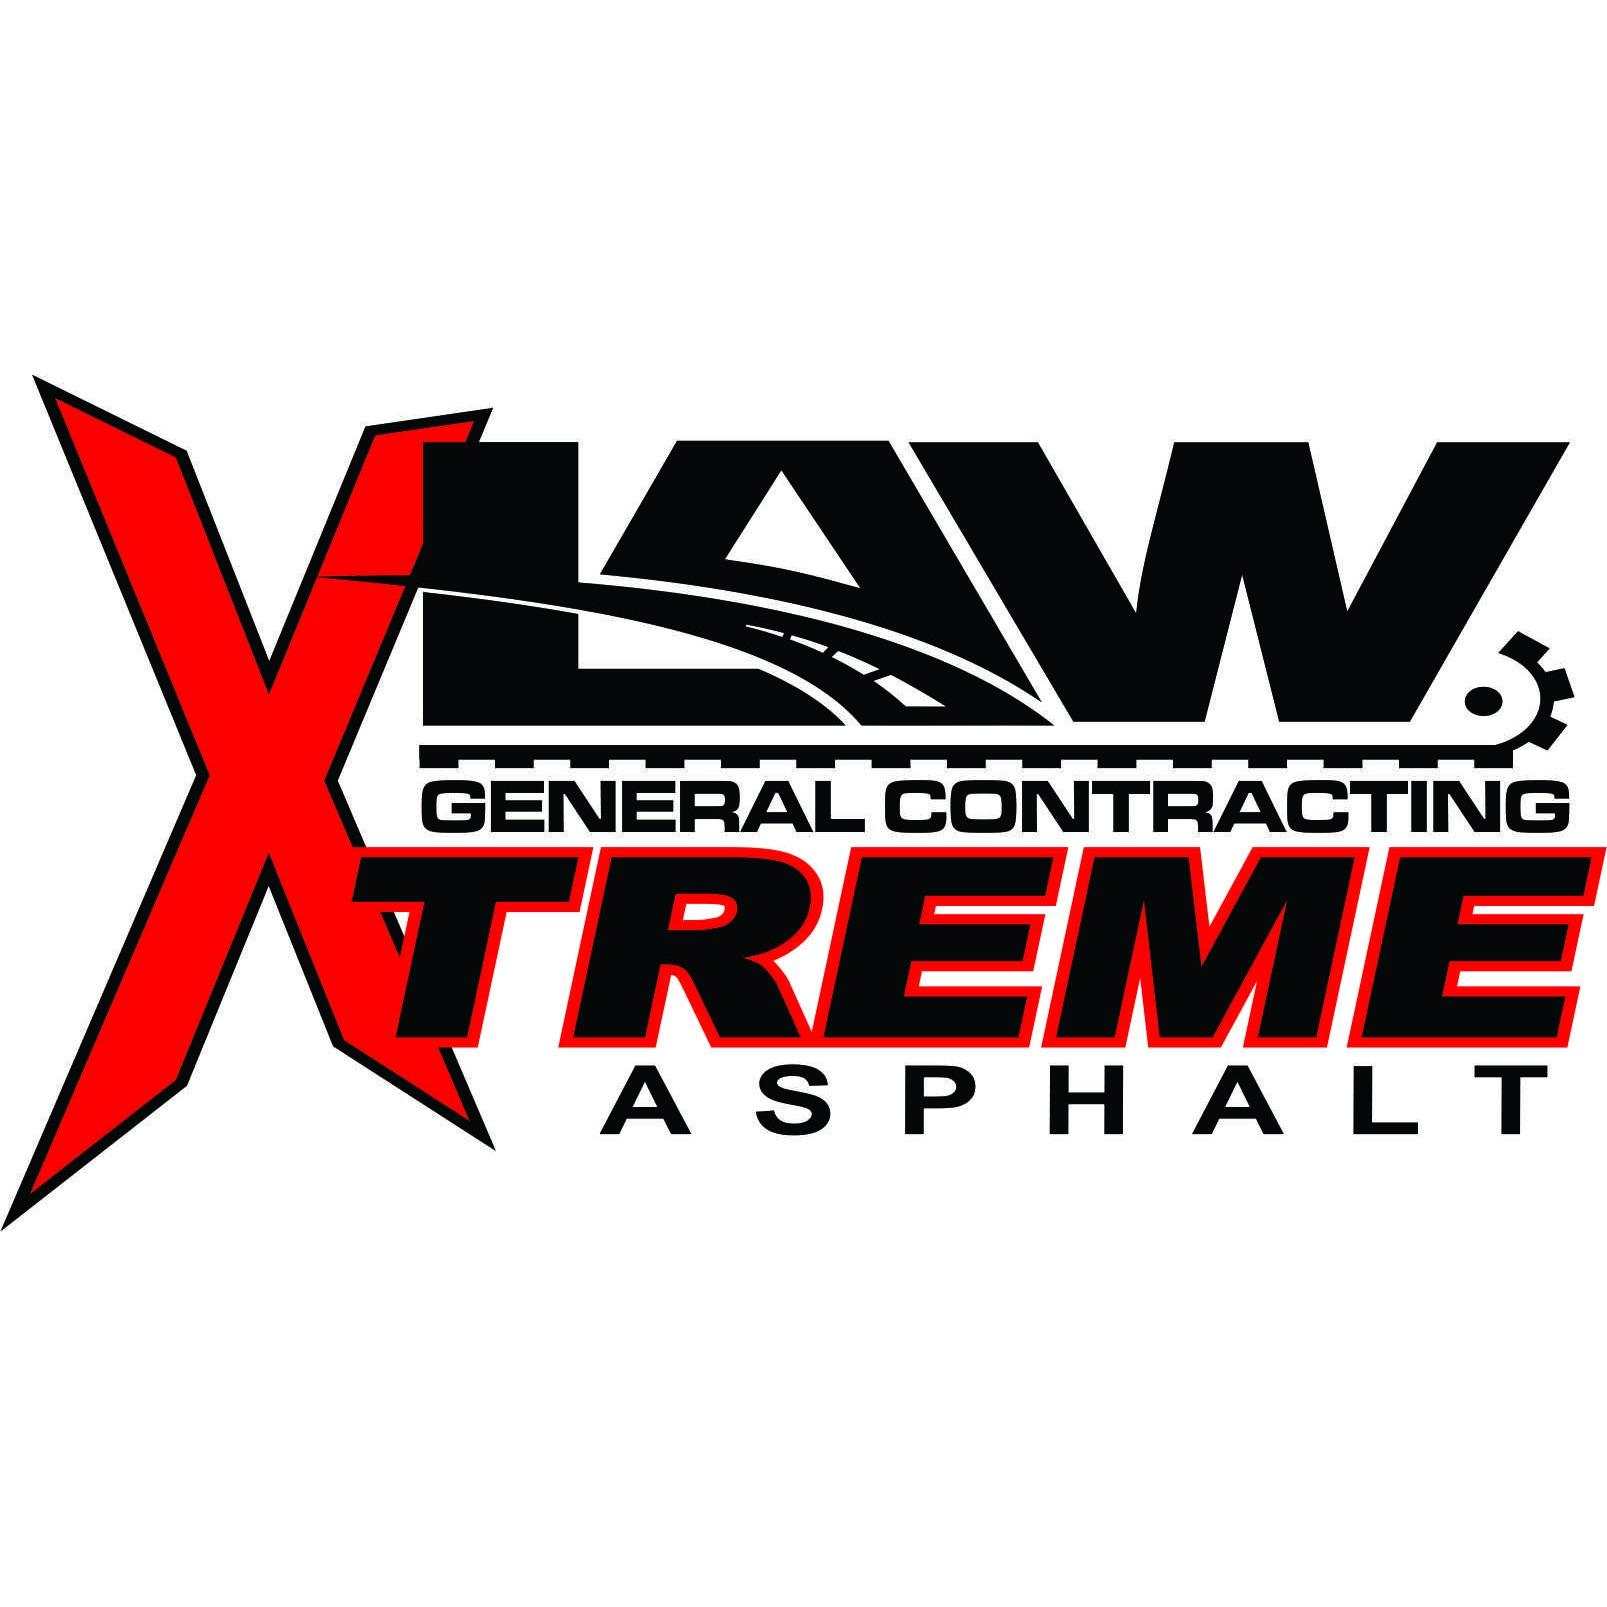 Xtreme Asphalt/Law General Contracting - Saint Louisville, OH - General Contractors